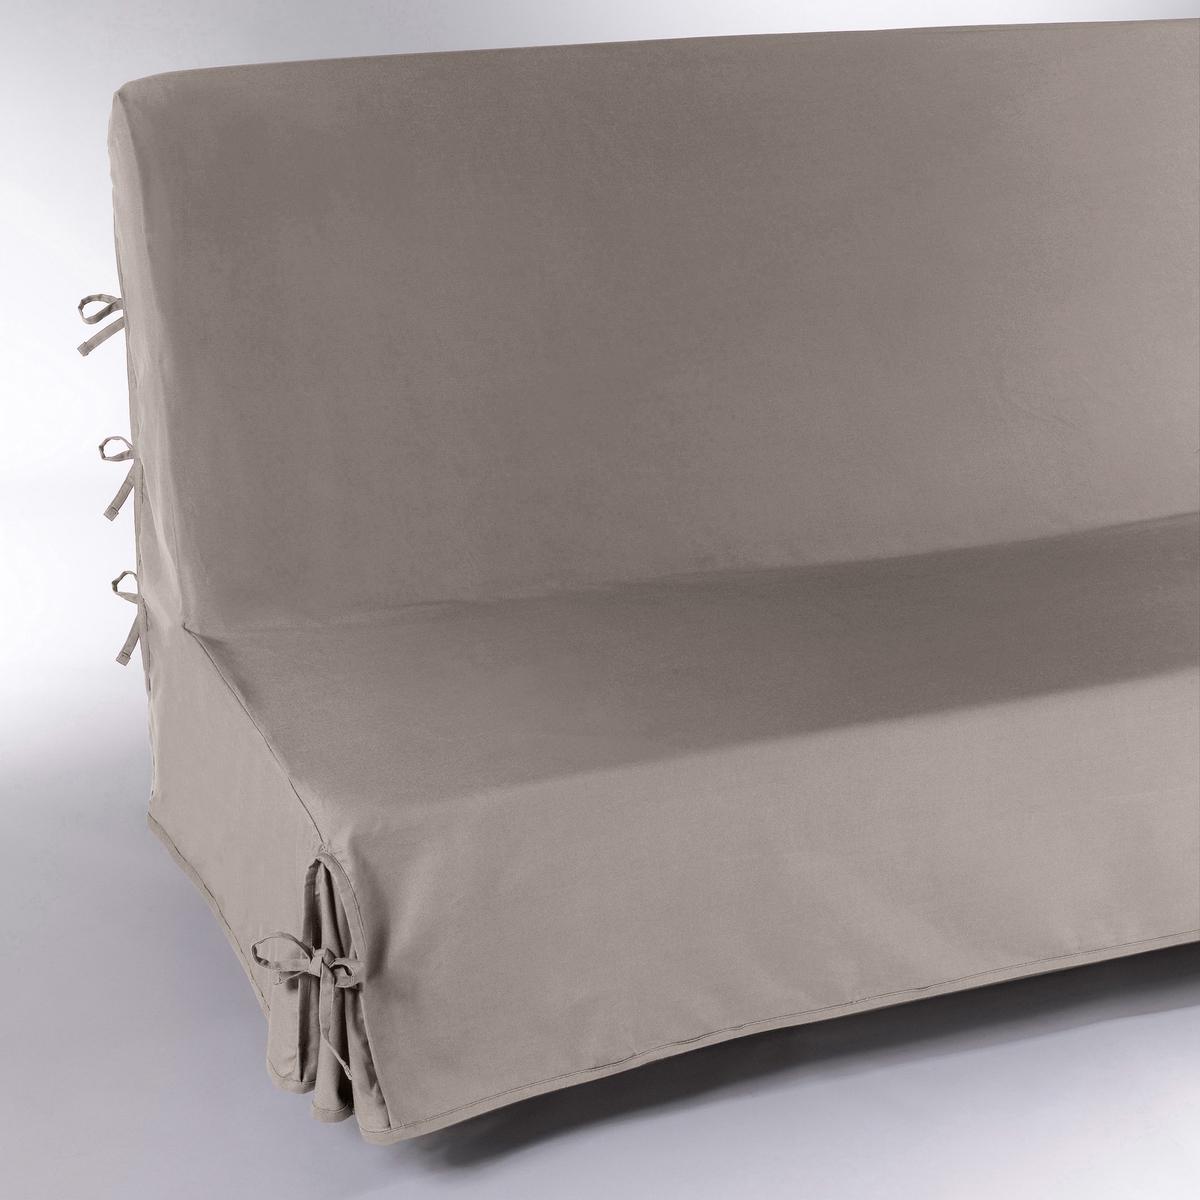 Чехол LaRedoute Для раскладного дивана SCENARIO 160 см бежевый